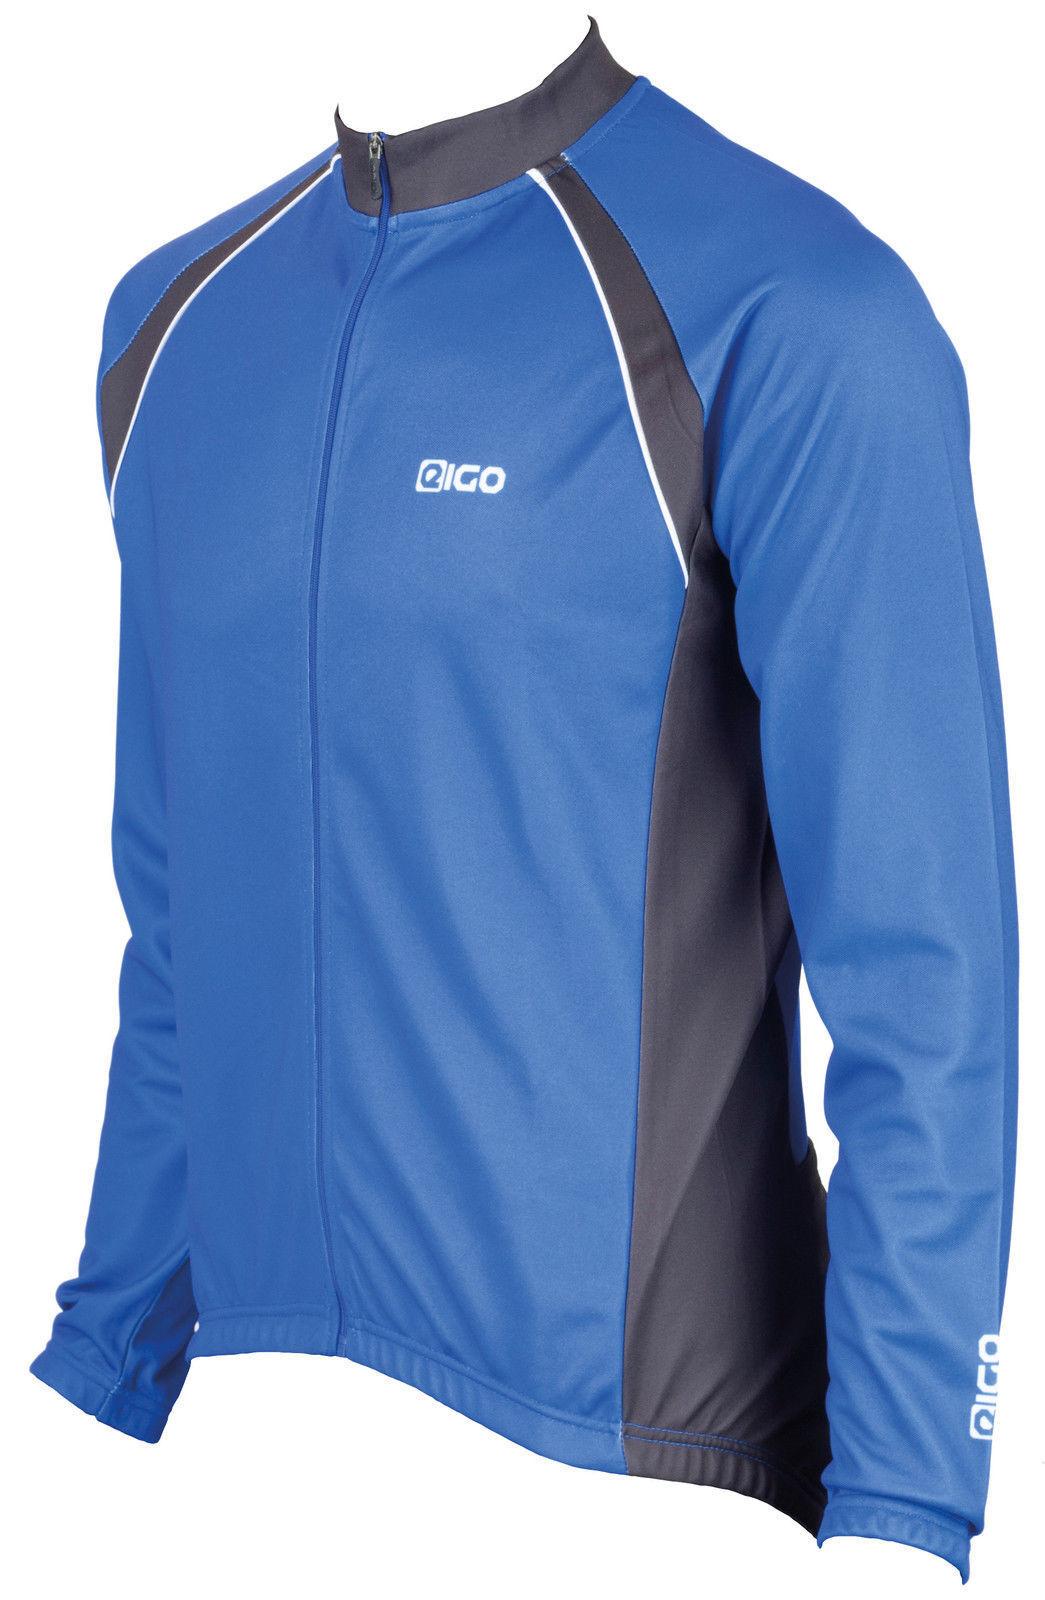 EIGO LOGIC LONG SLEEVE CYCLING JERSEY-THERMAL WINTER SPRING ROAD MTB blueE